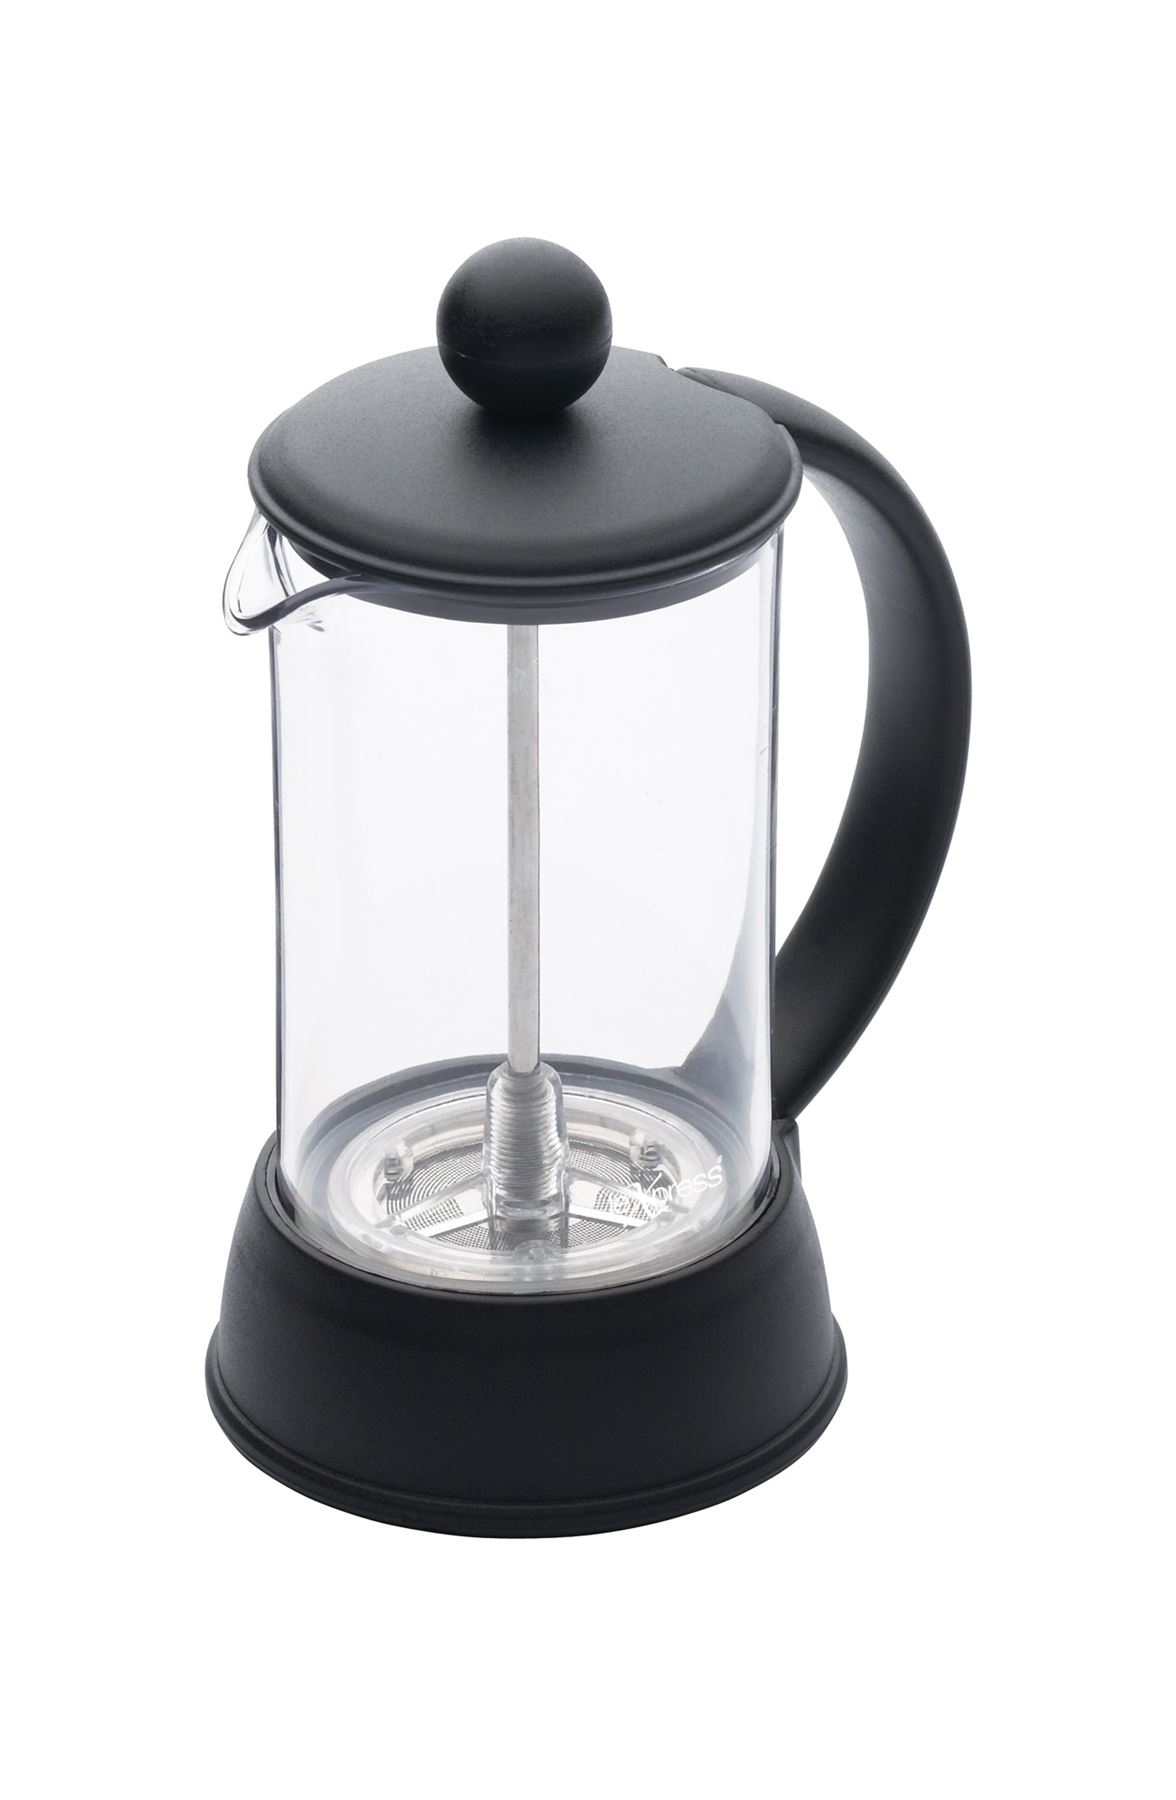 VITROFORM SPARKLE GLASS BATHROOM SINK BOWL  VANITY MID CENTURY RETRO PAIR LOT